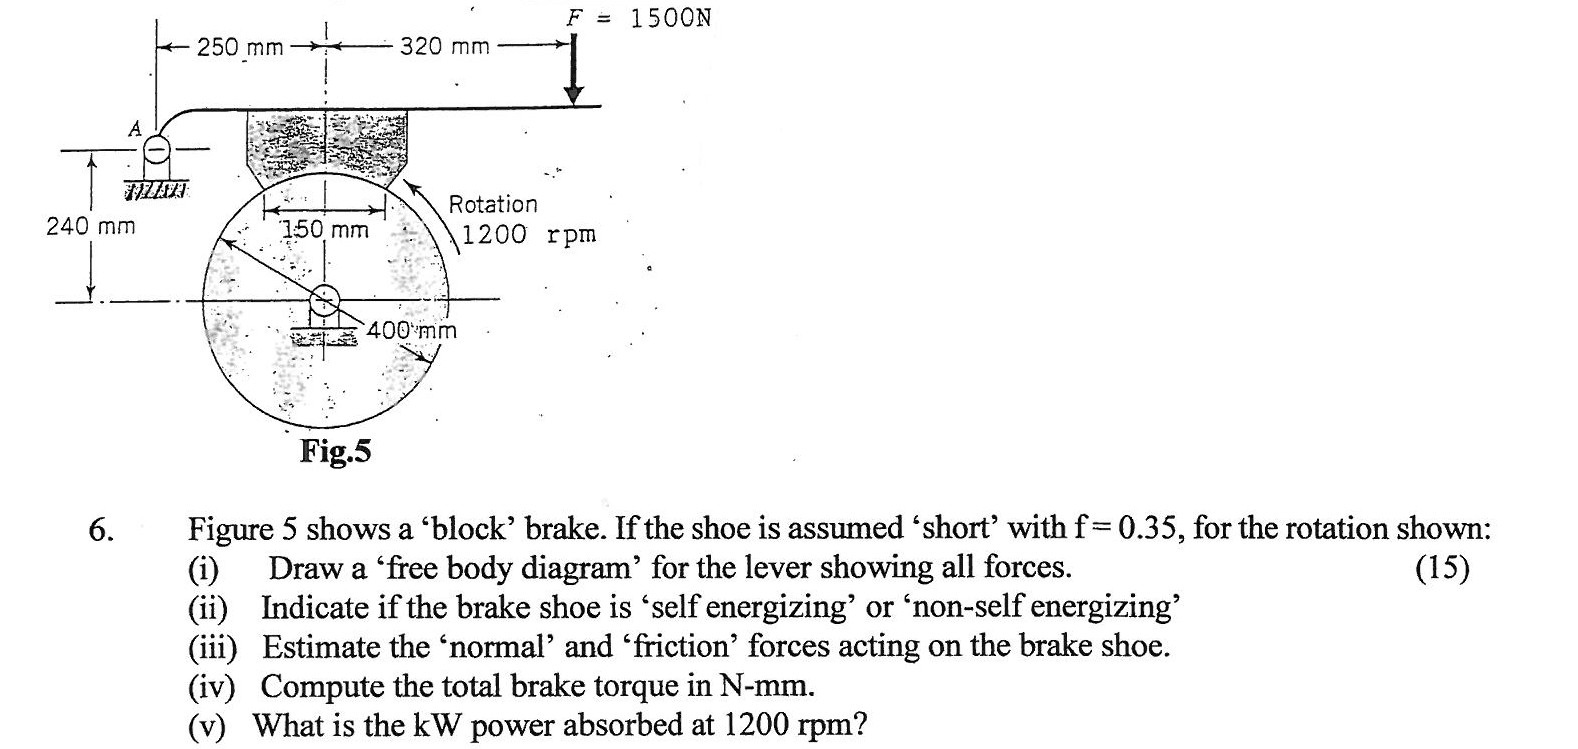 Cheap Brake Jobs >> Figure 5 Shows A 'block' Brake. If The Shoe Is ... | Chegg.com